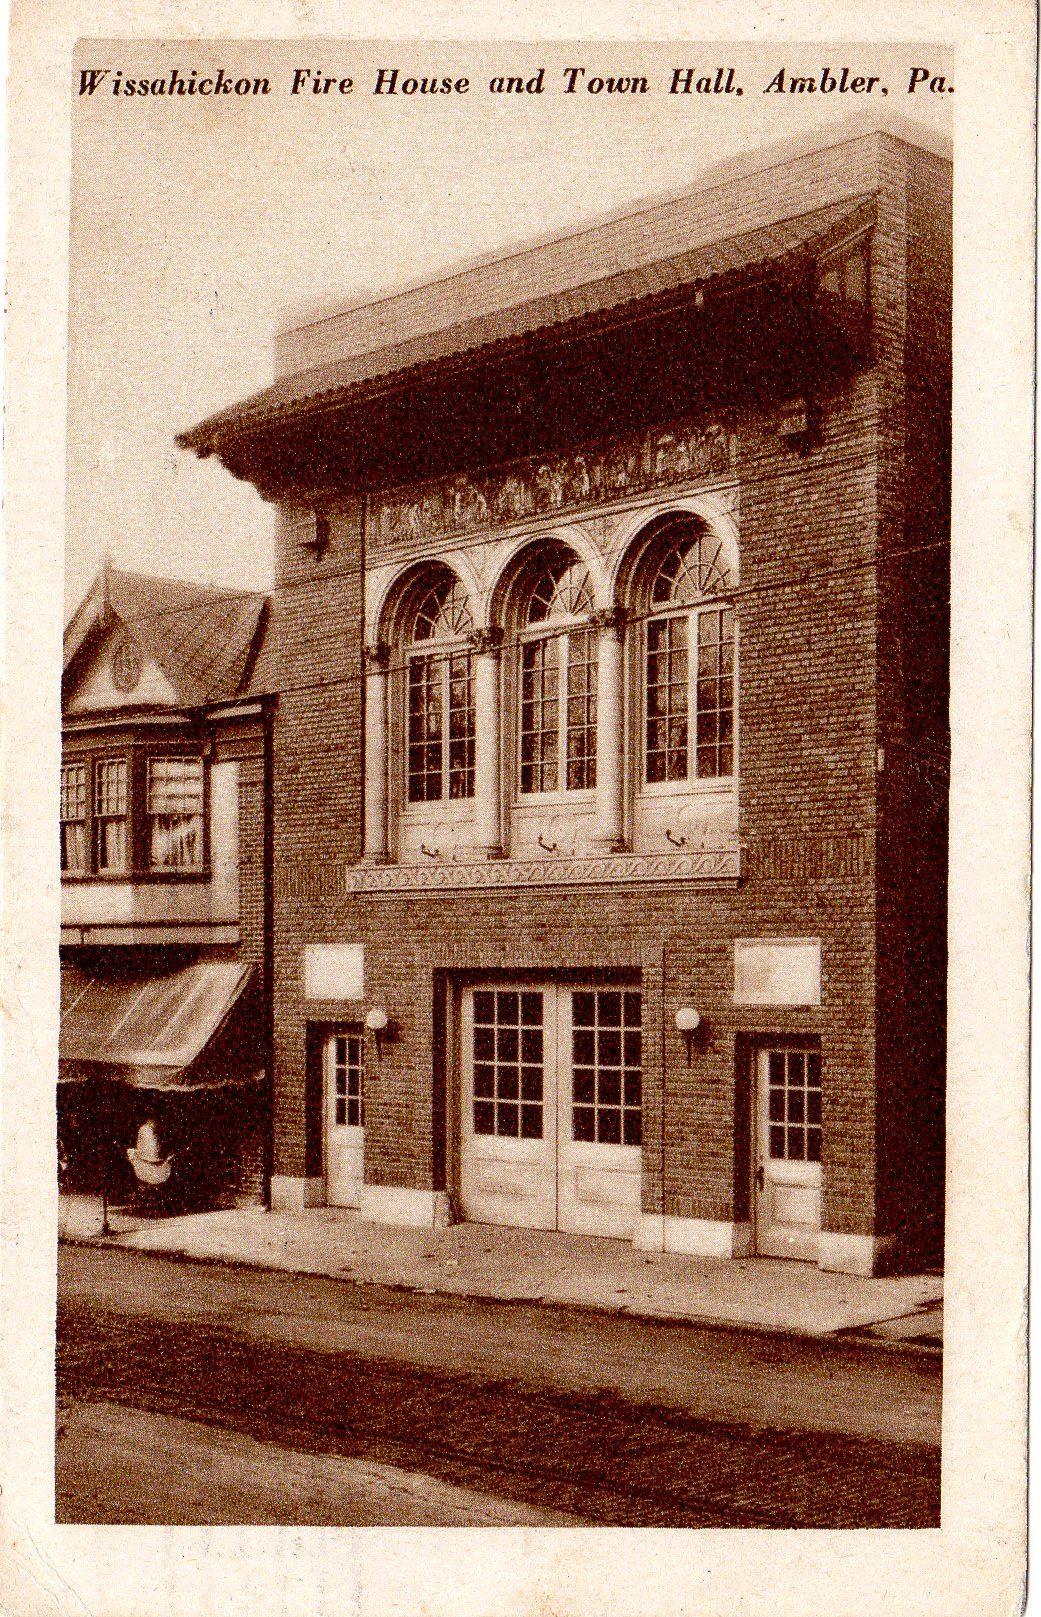 Post Card Collection (E Simon)_2682_10_Wissahickon Fire House & Town Hall, Ambler, Pa_Sep 1926